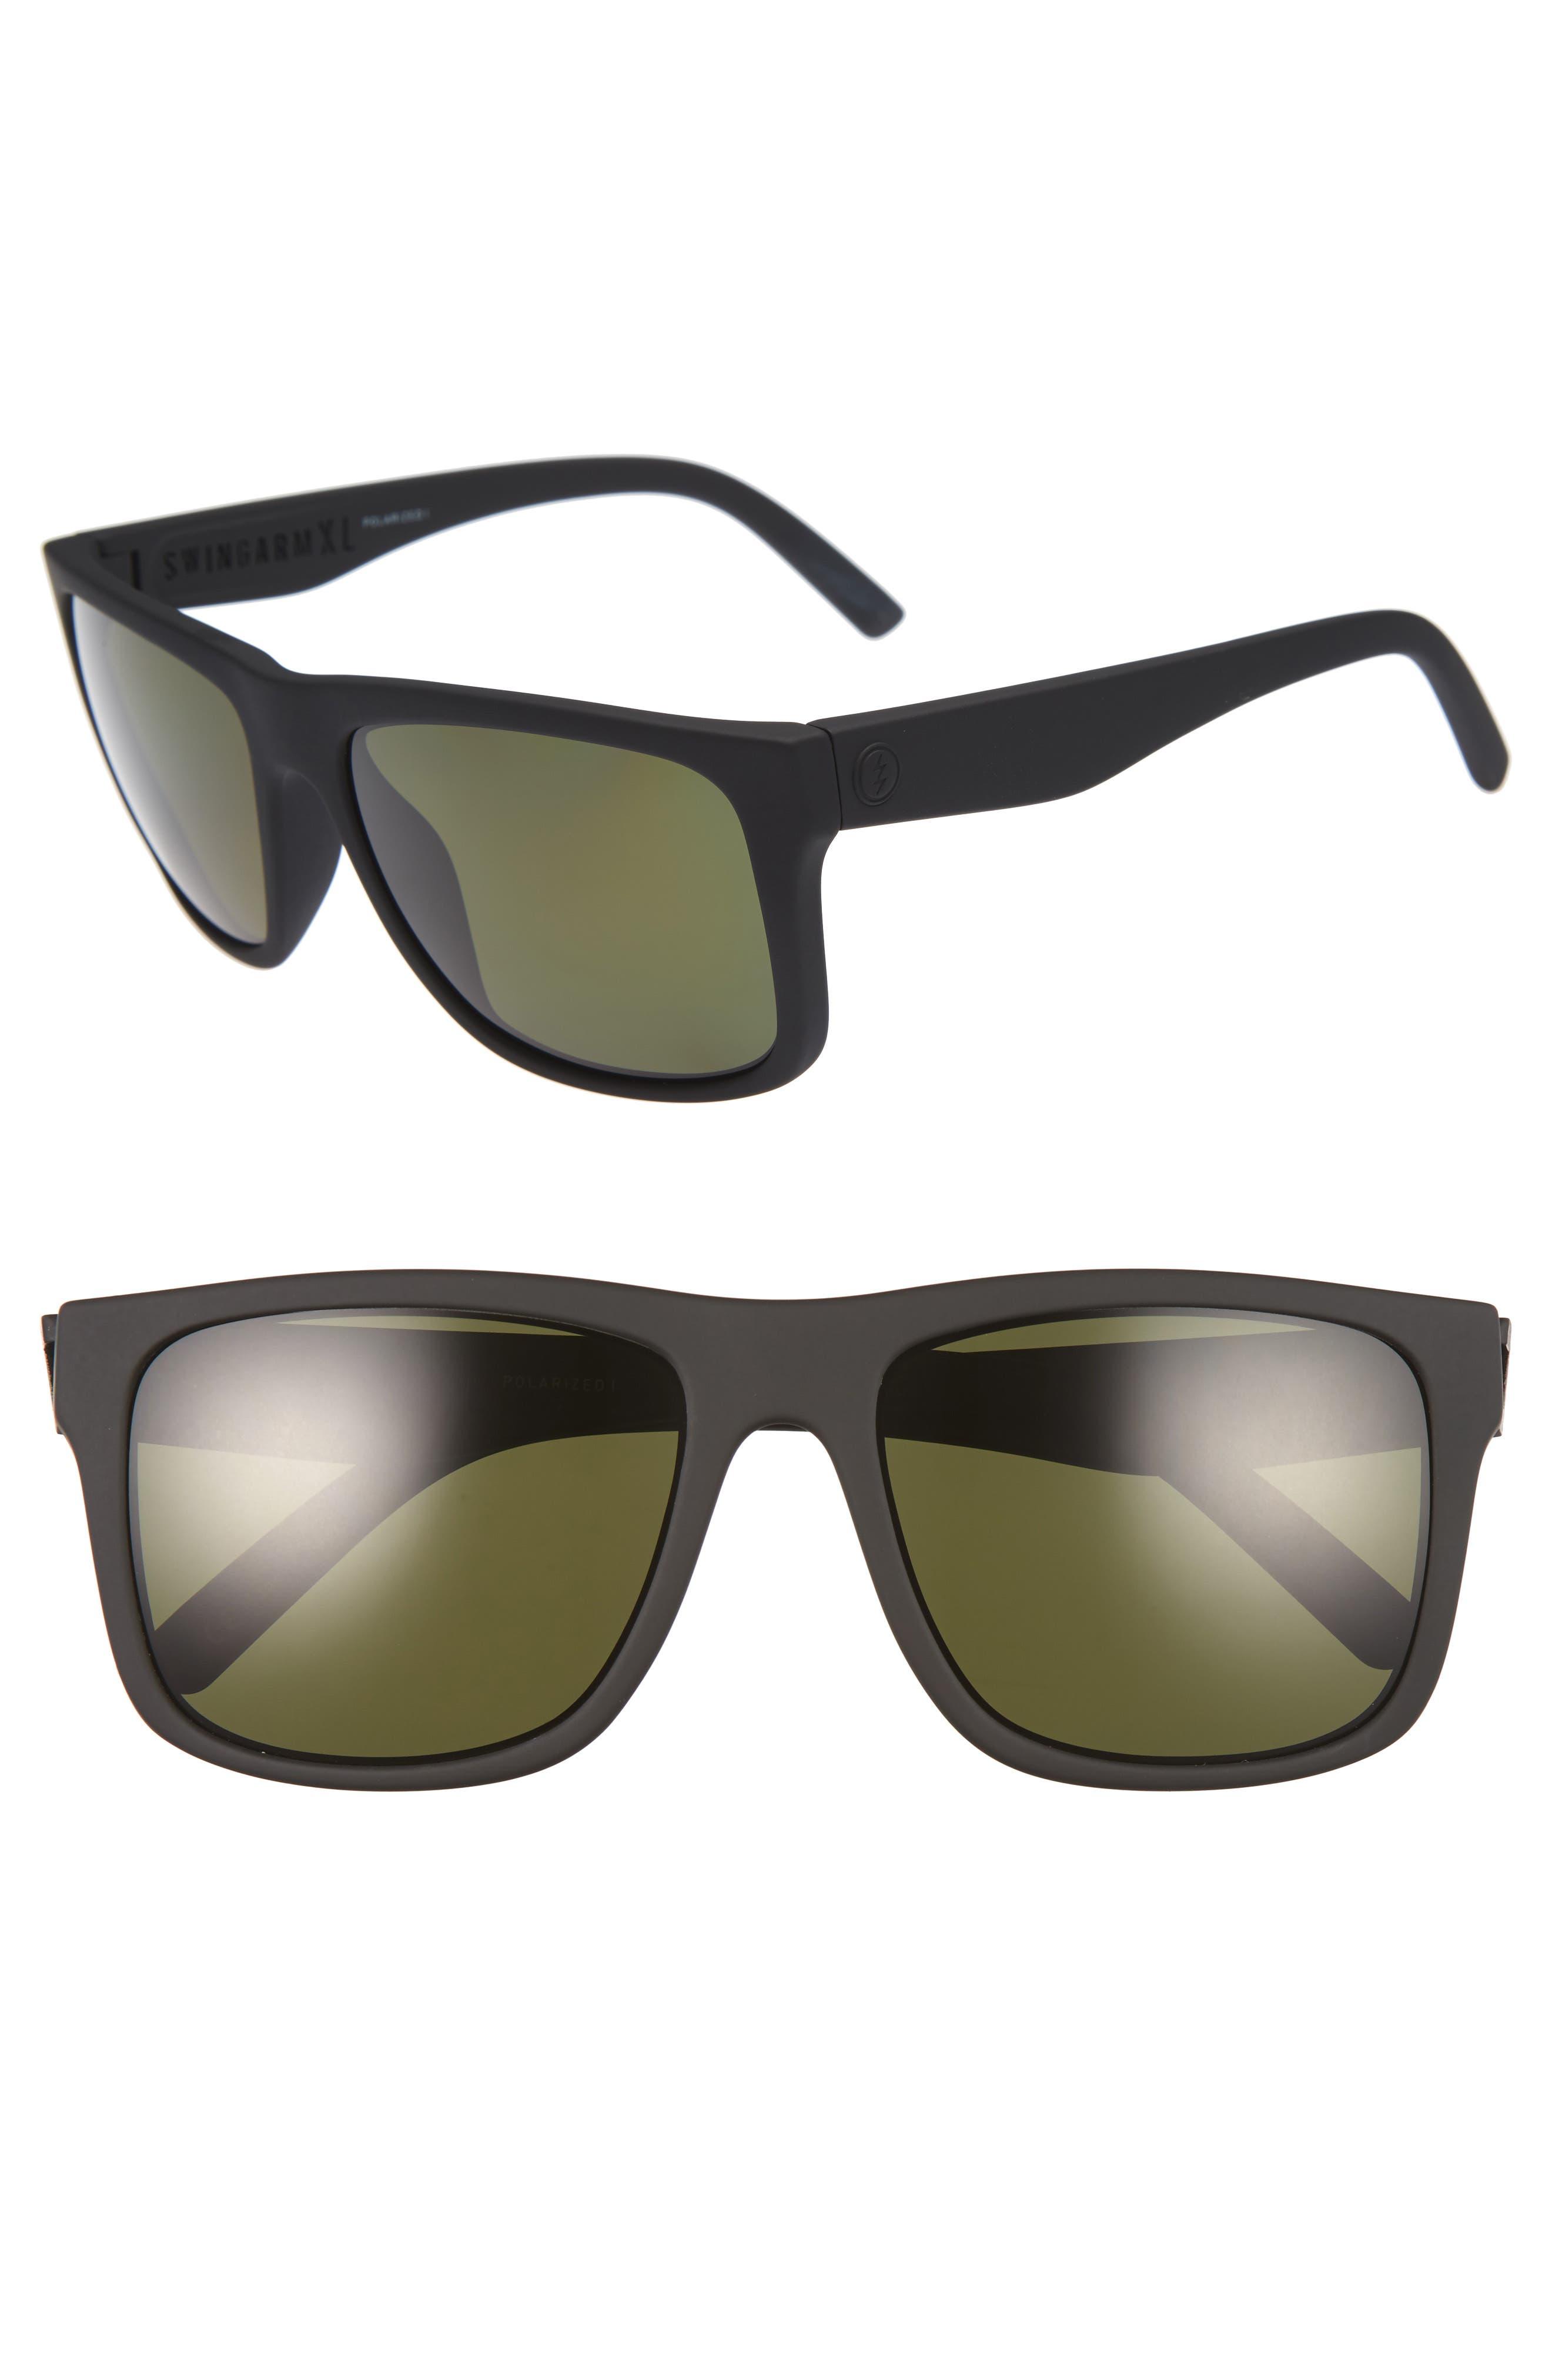 Swingarm XL 59mm Polarized Sunglasses,                             Main thumbnail 1, color,                             001